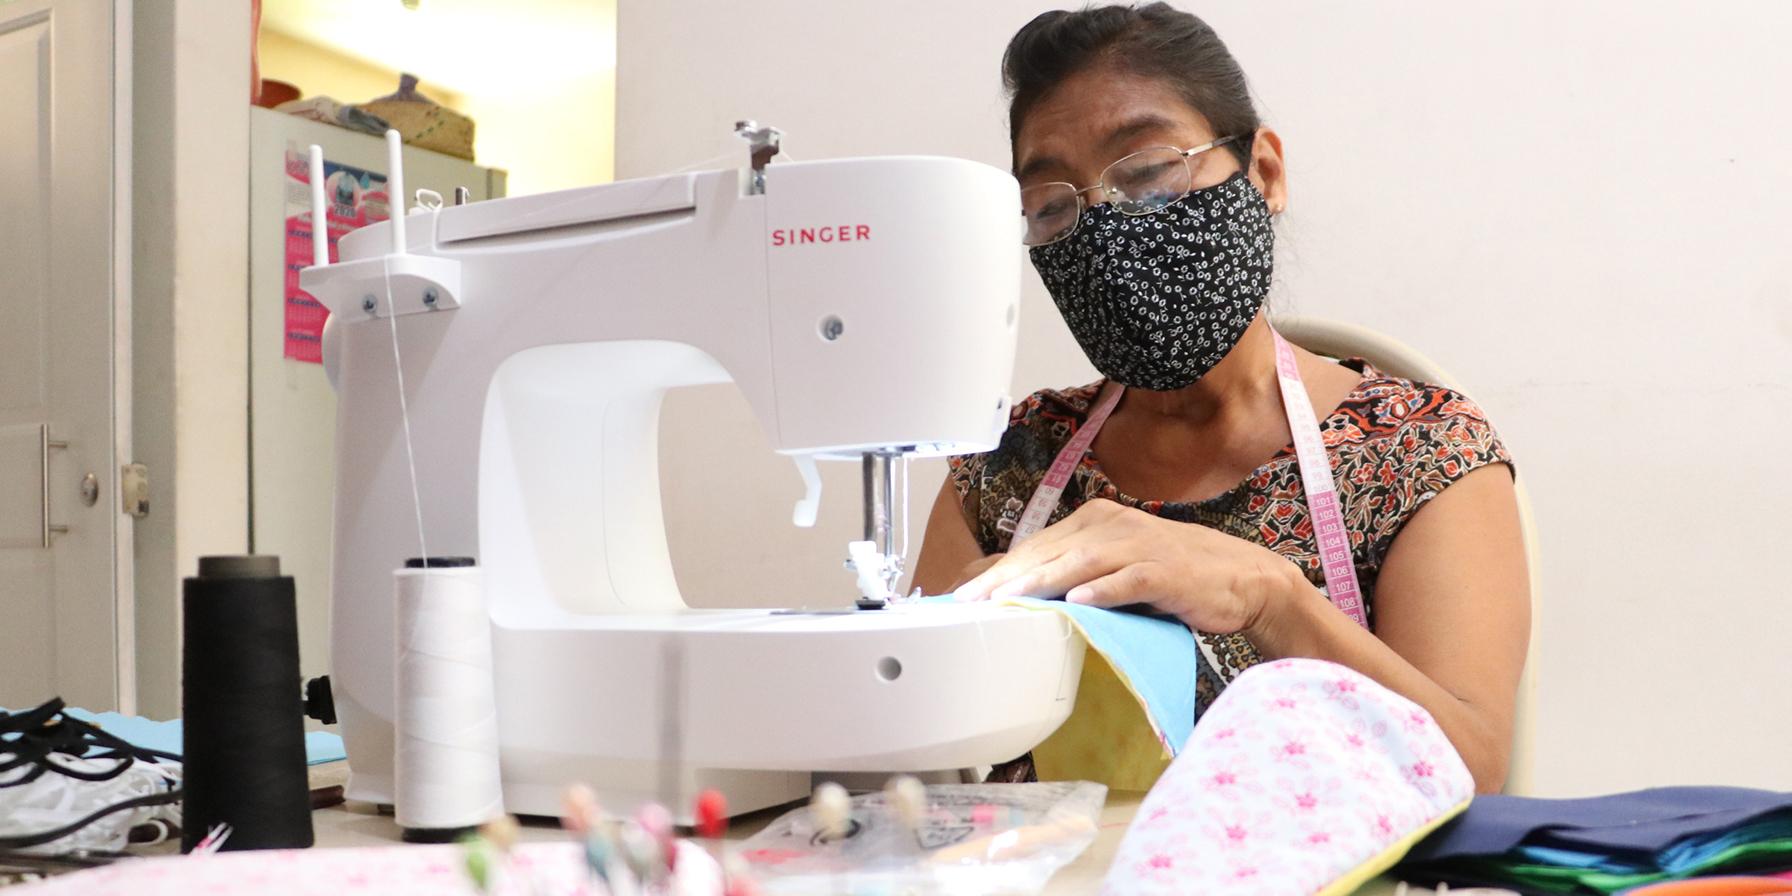 El desempleo lleva a Virginia a emprender | El Imparcial de Oaxaca